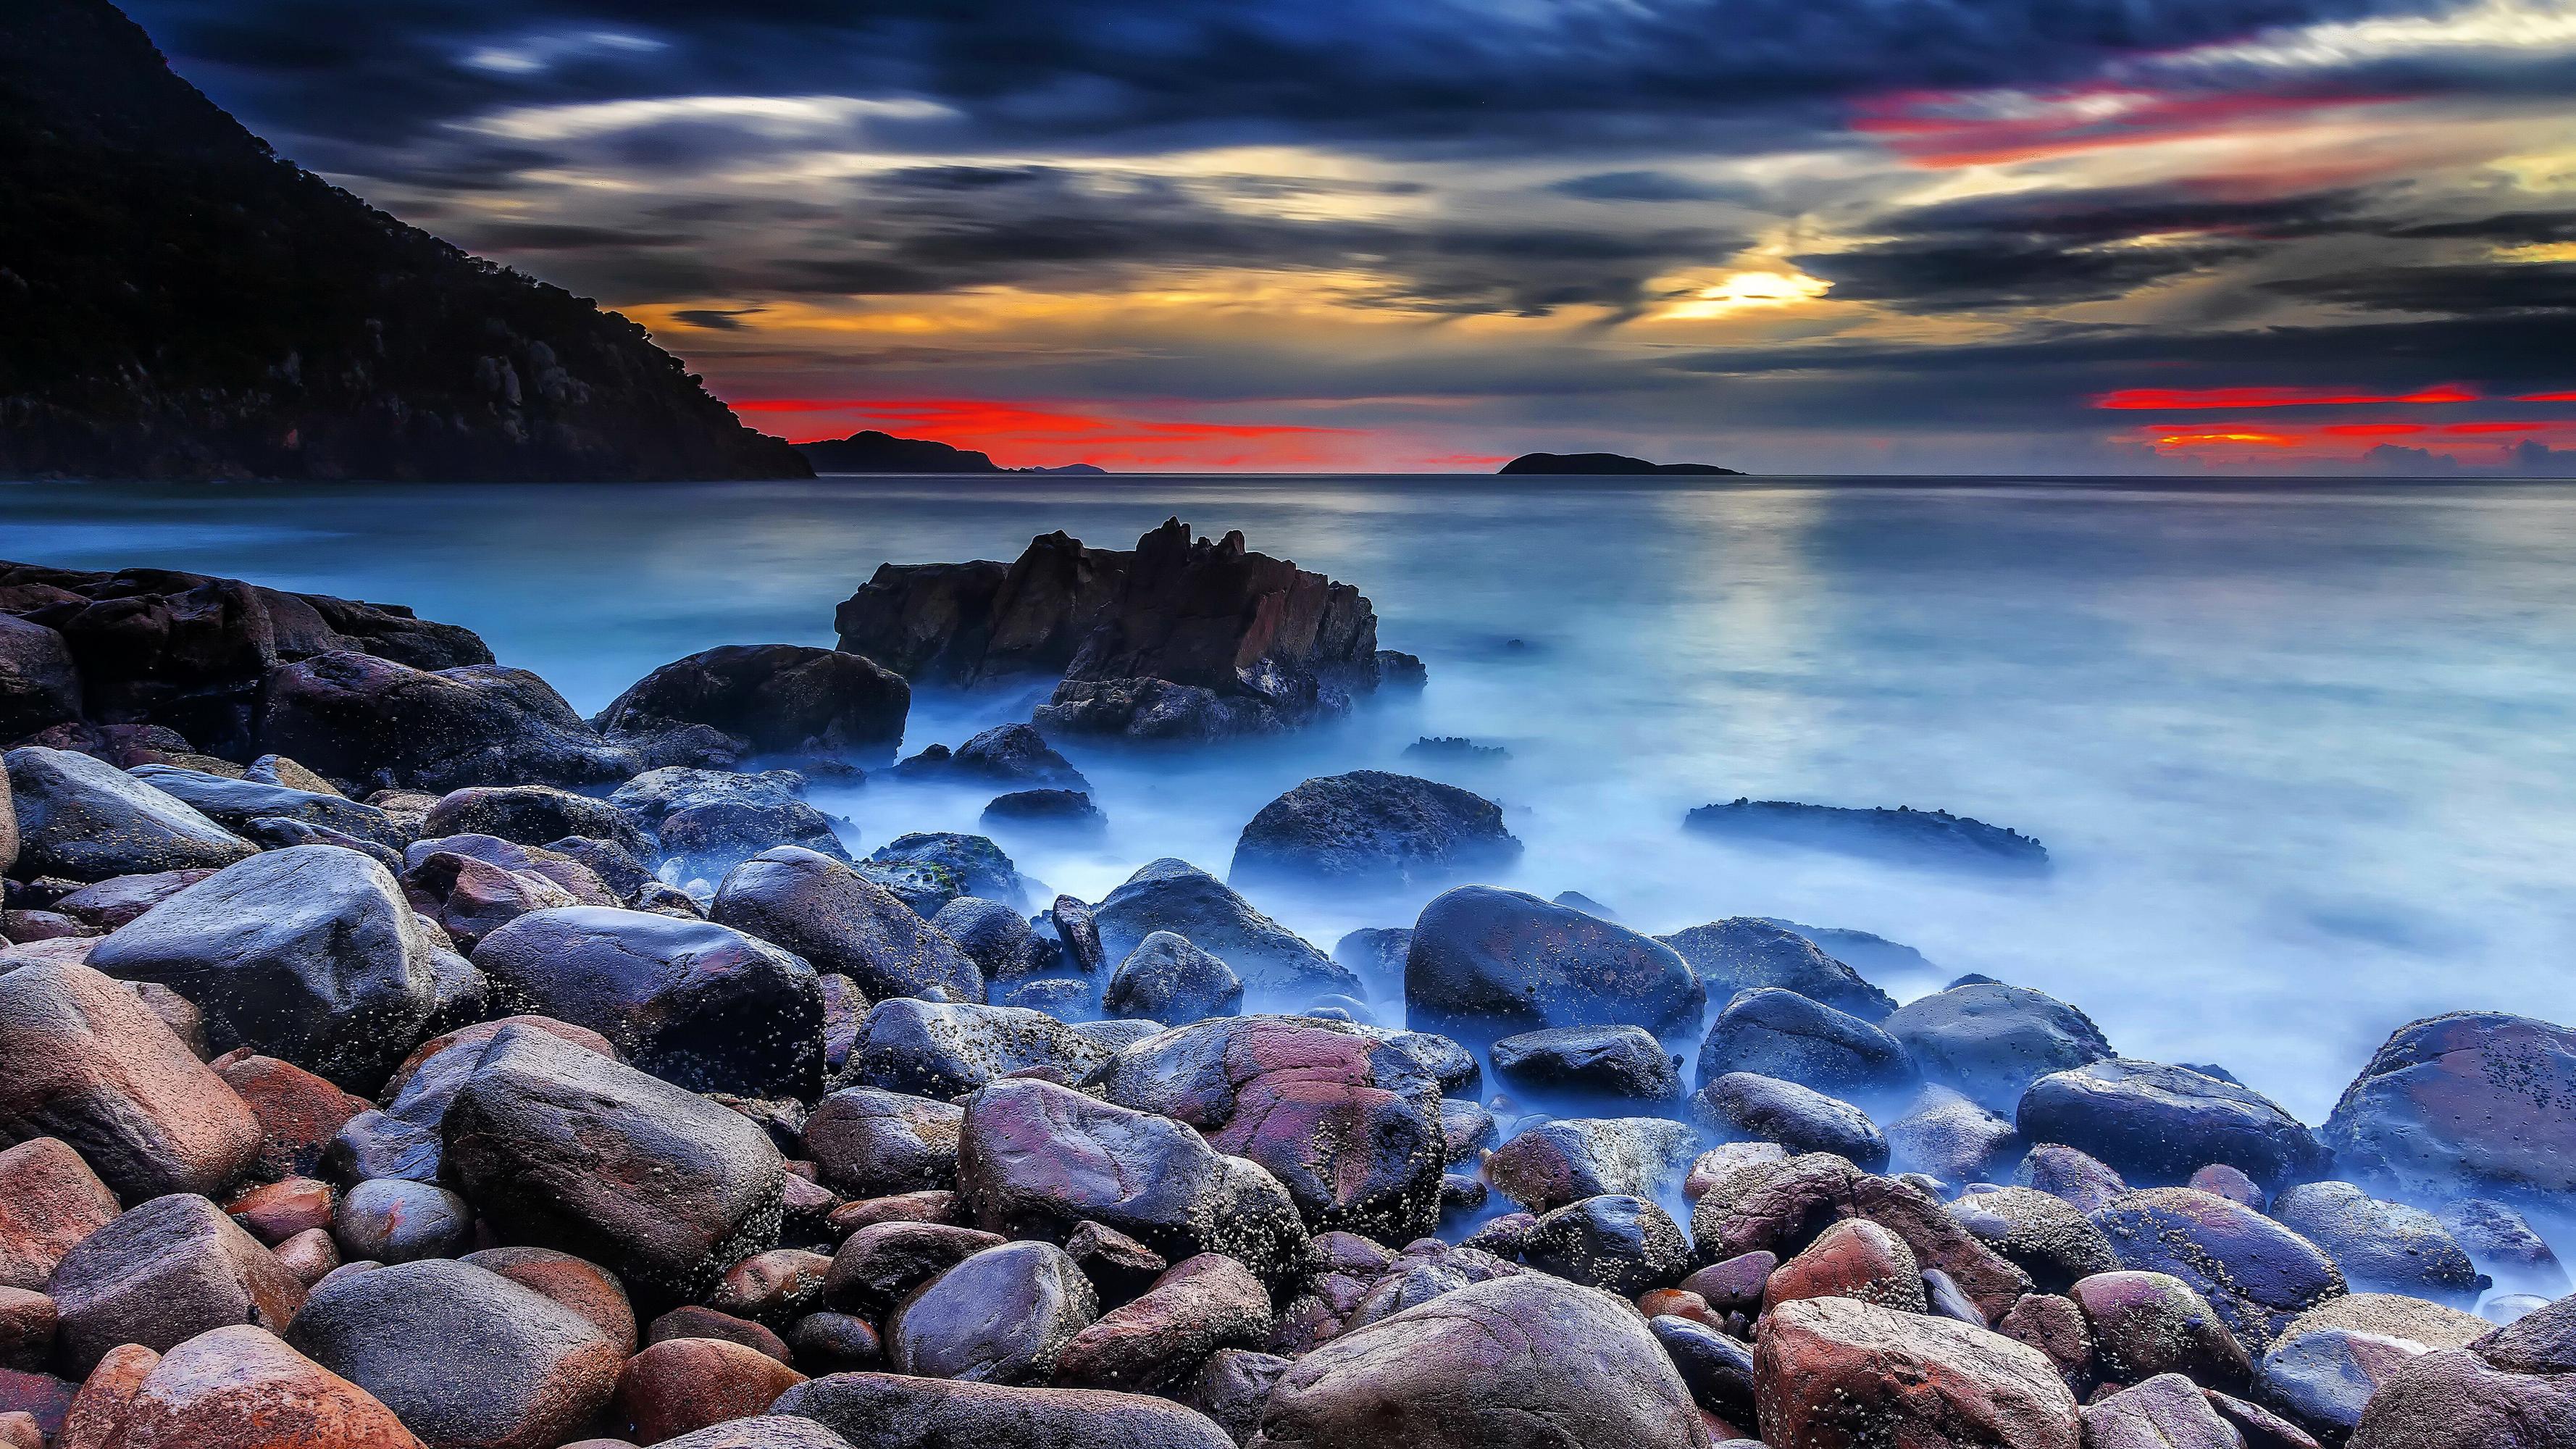 закат камень берег море sunset stone shore sea  № 1023753 без смс